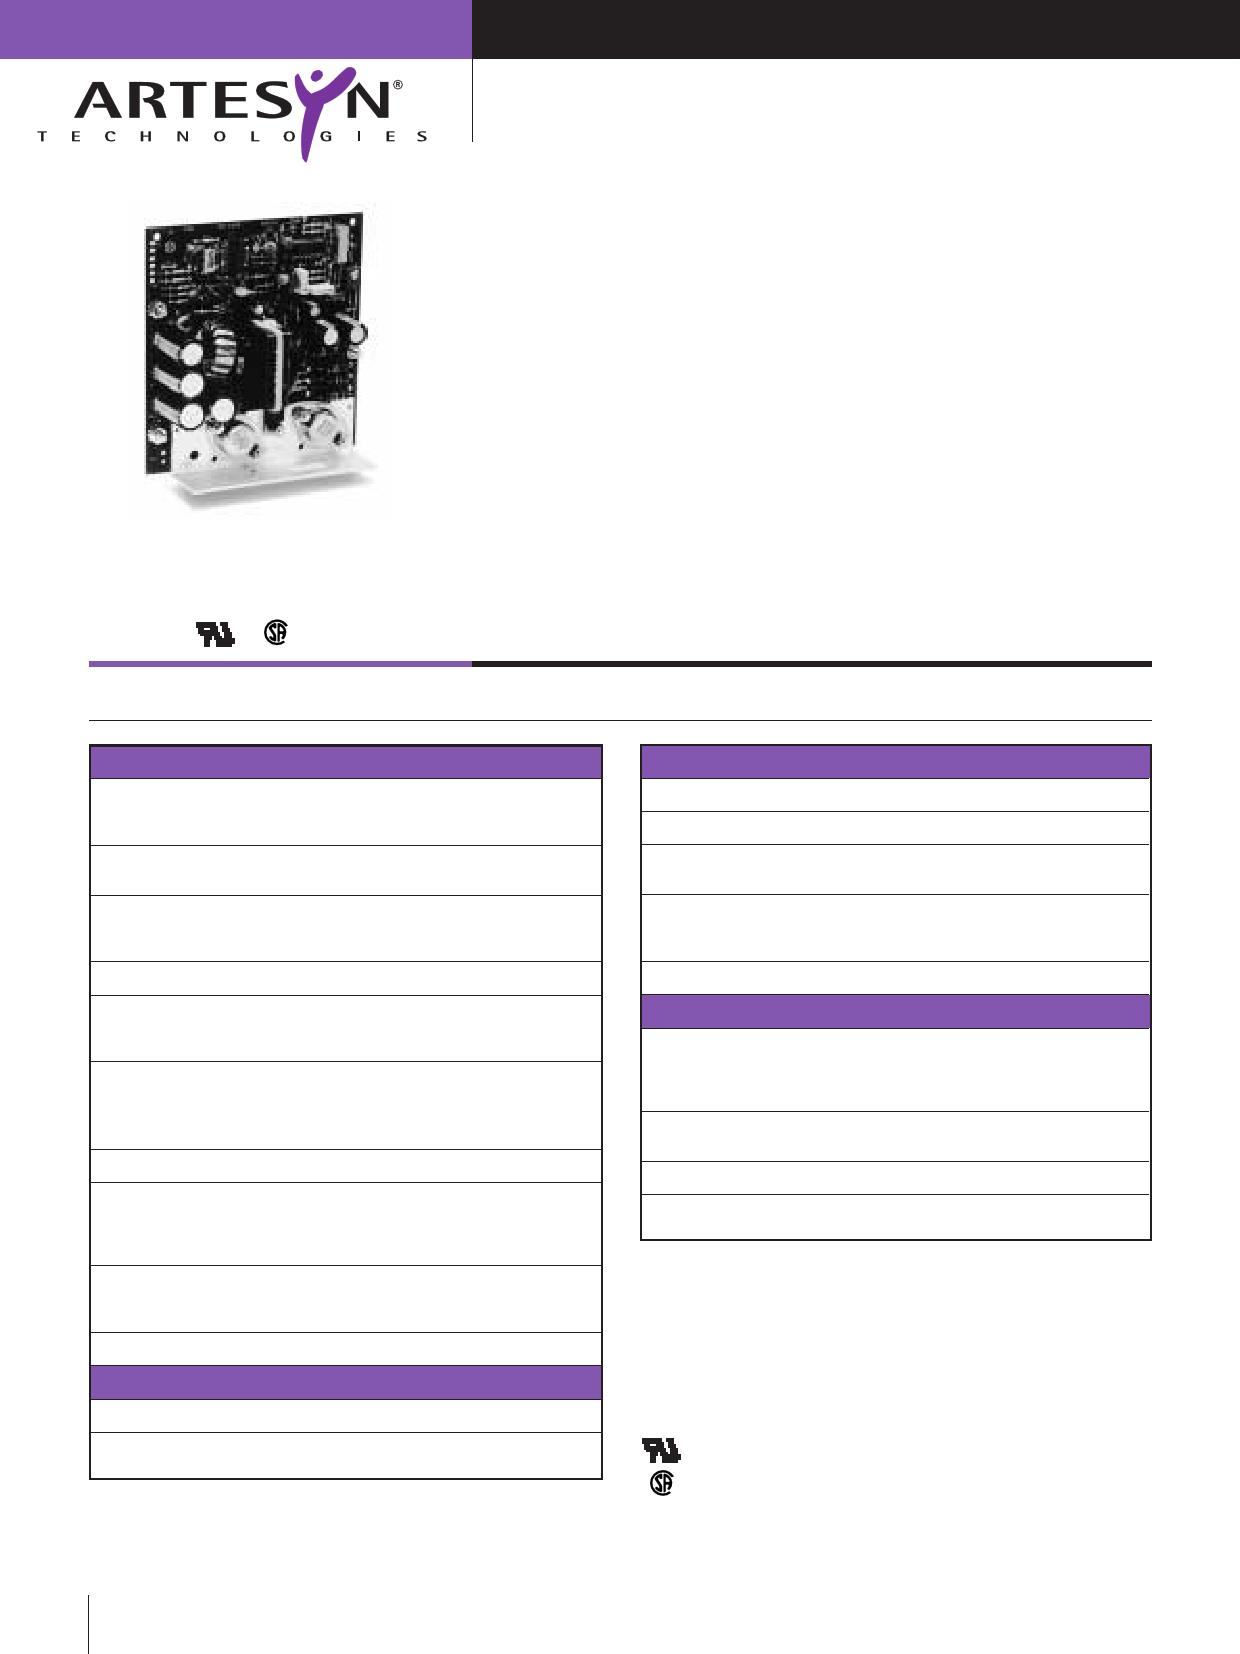 3T20AP-6115 Datasheet, 3T20AP-6115 PDF,ピン配置, 機能